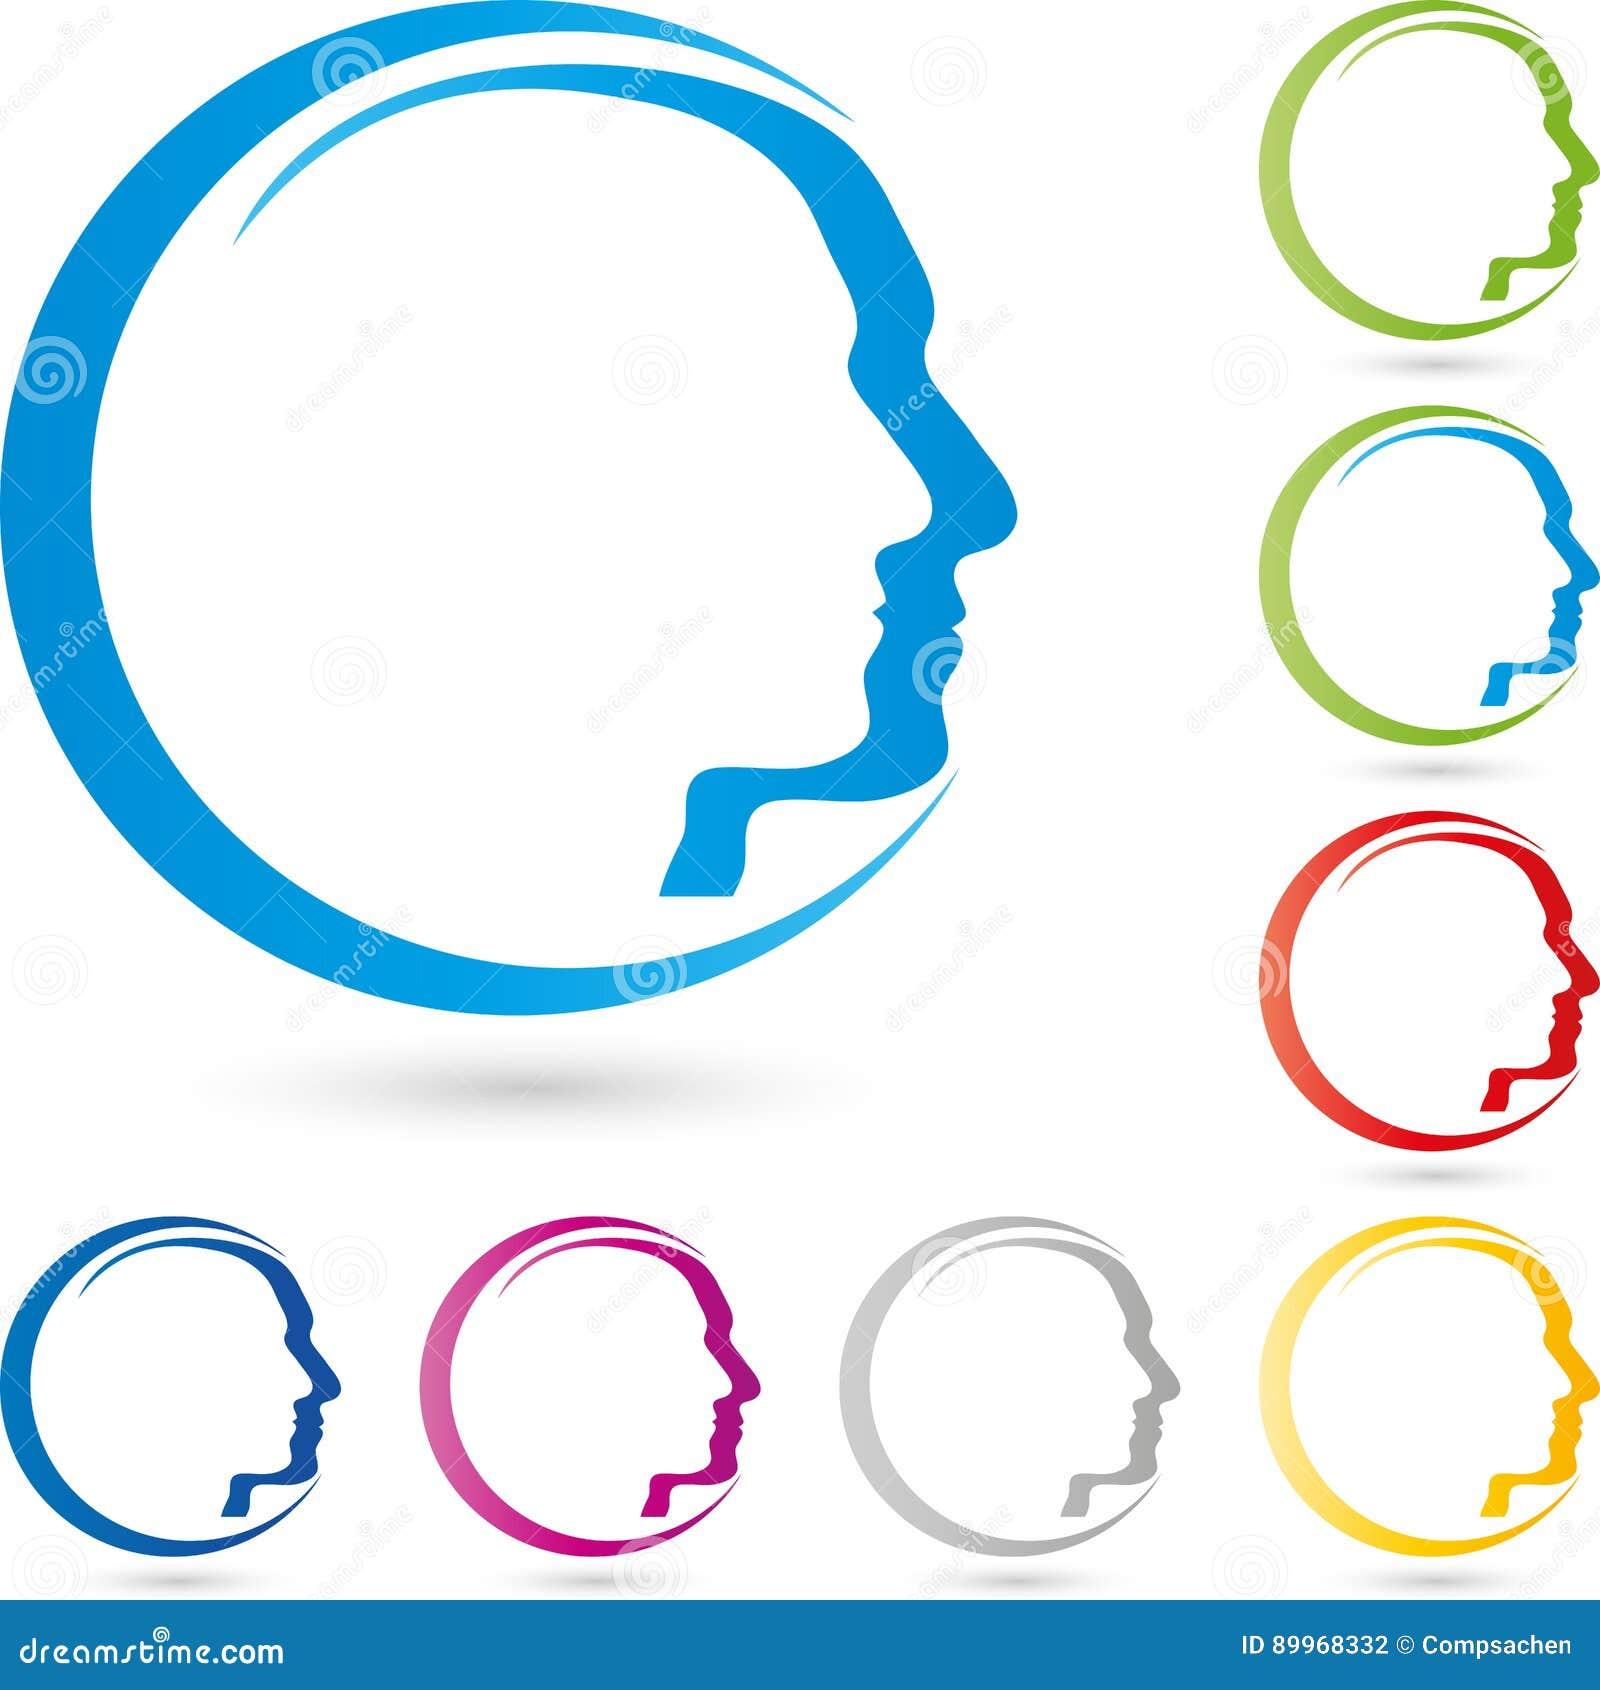 Face, Head, Human, Face Logo Stock Vector - Illustration